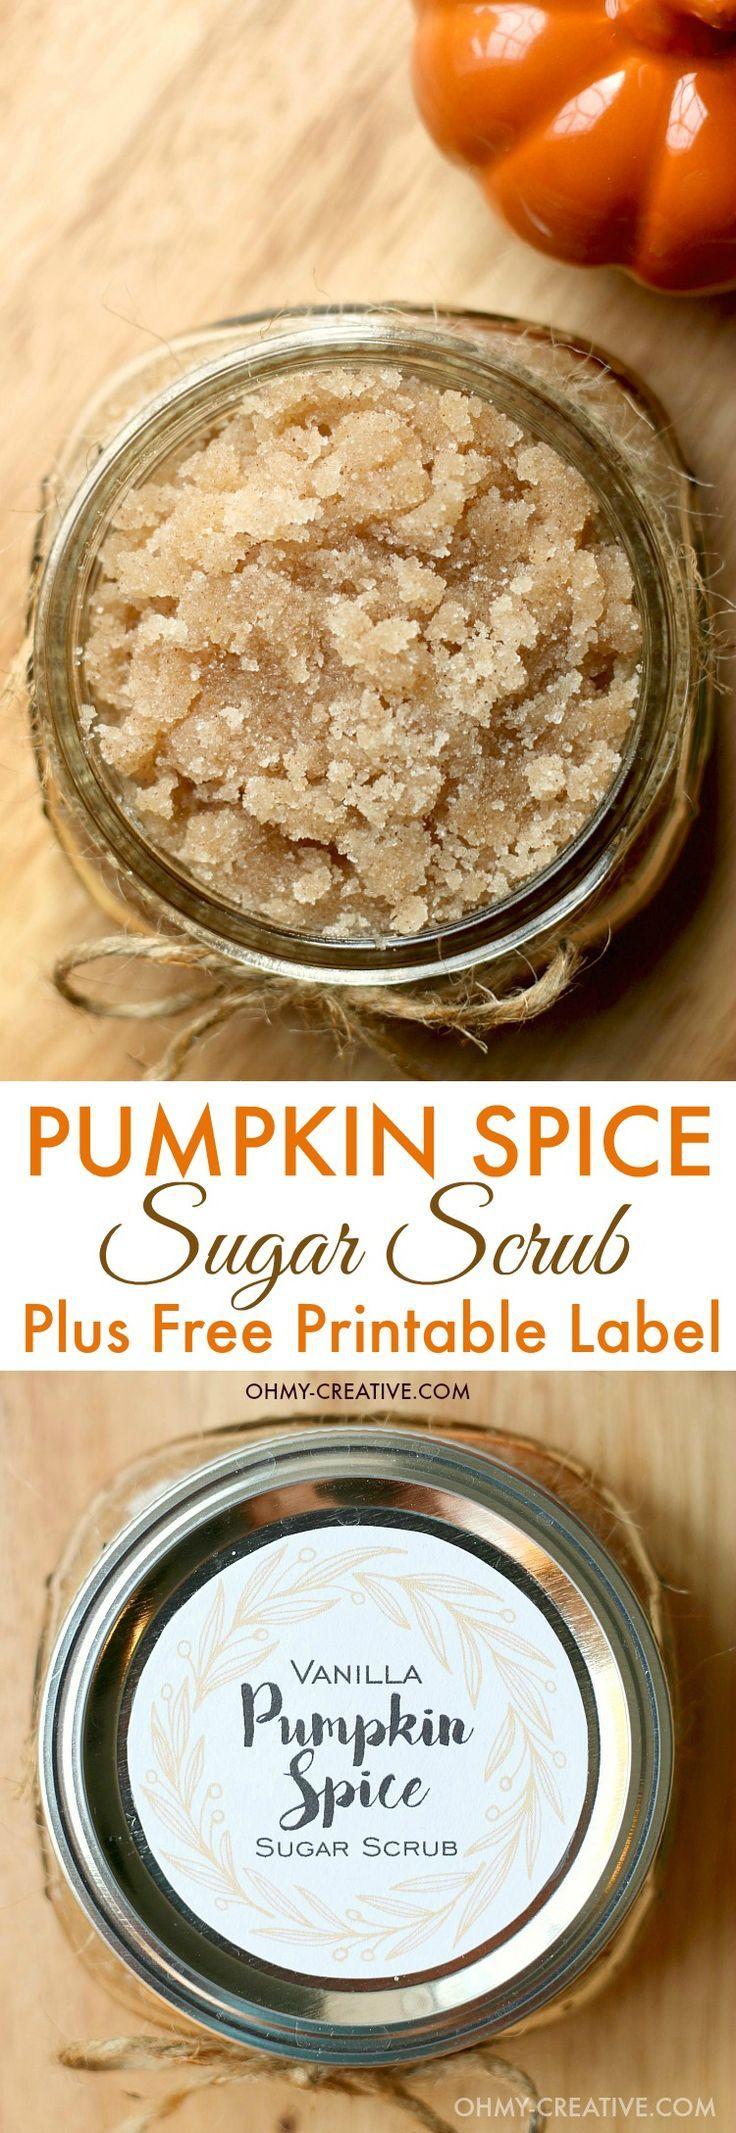 The aroma of this all natural Vanilla Pumpkin Spice Sugar Scrub is simply amazin...